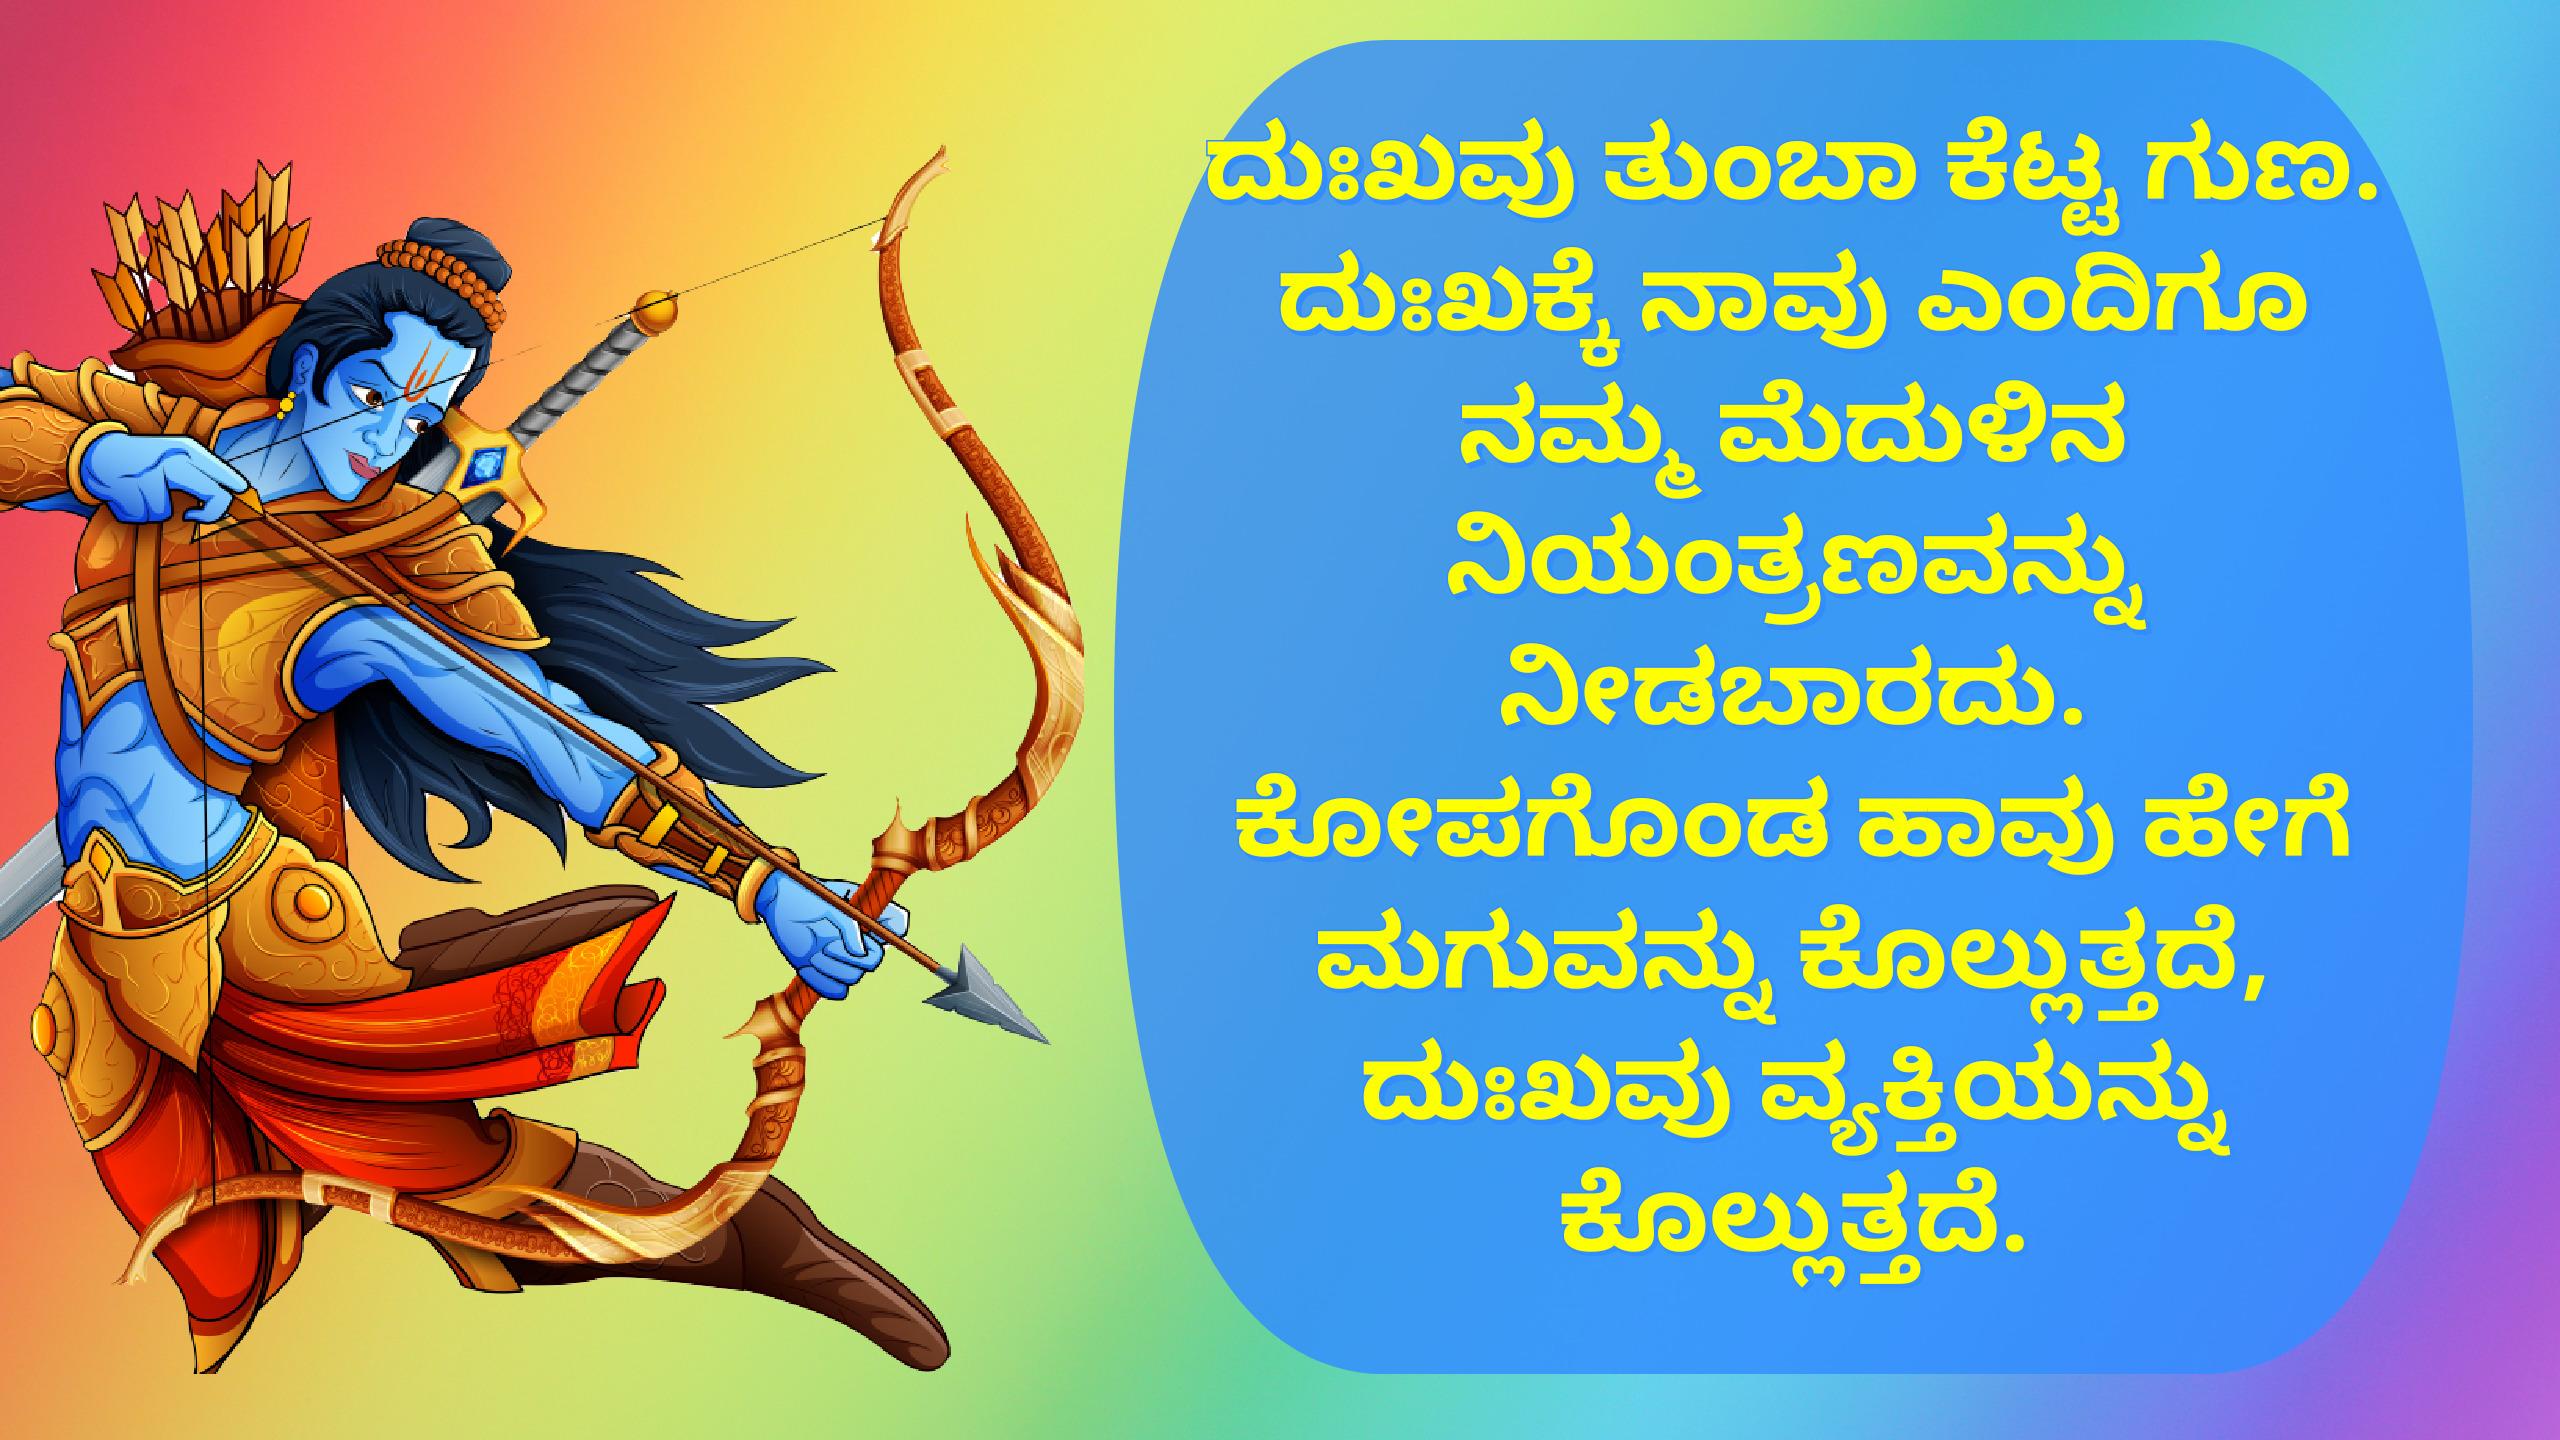 20. Shree Ram Quotes in Kannada